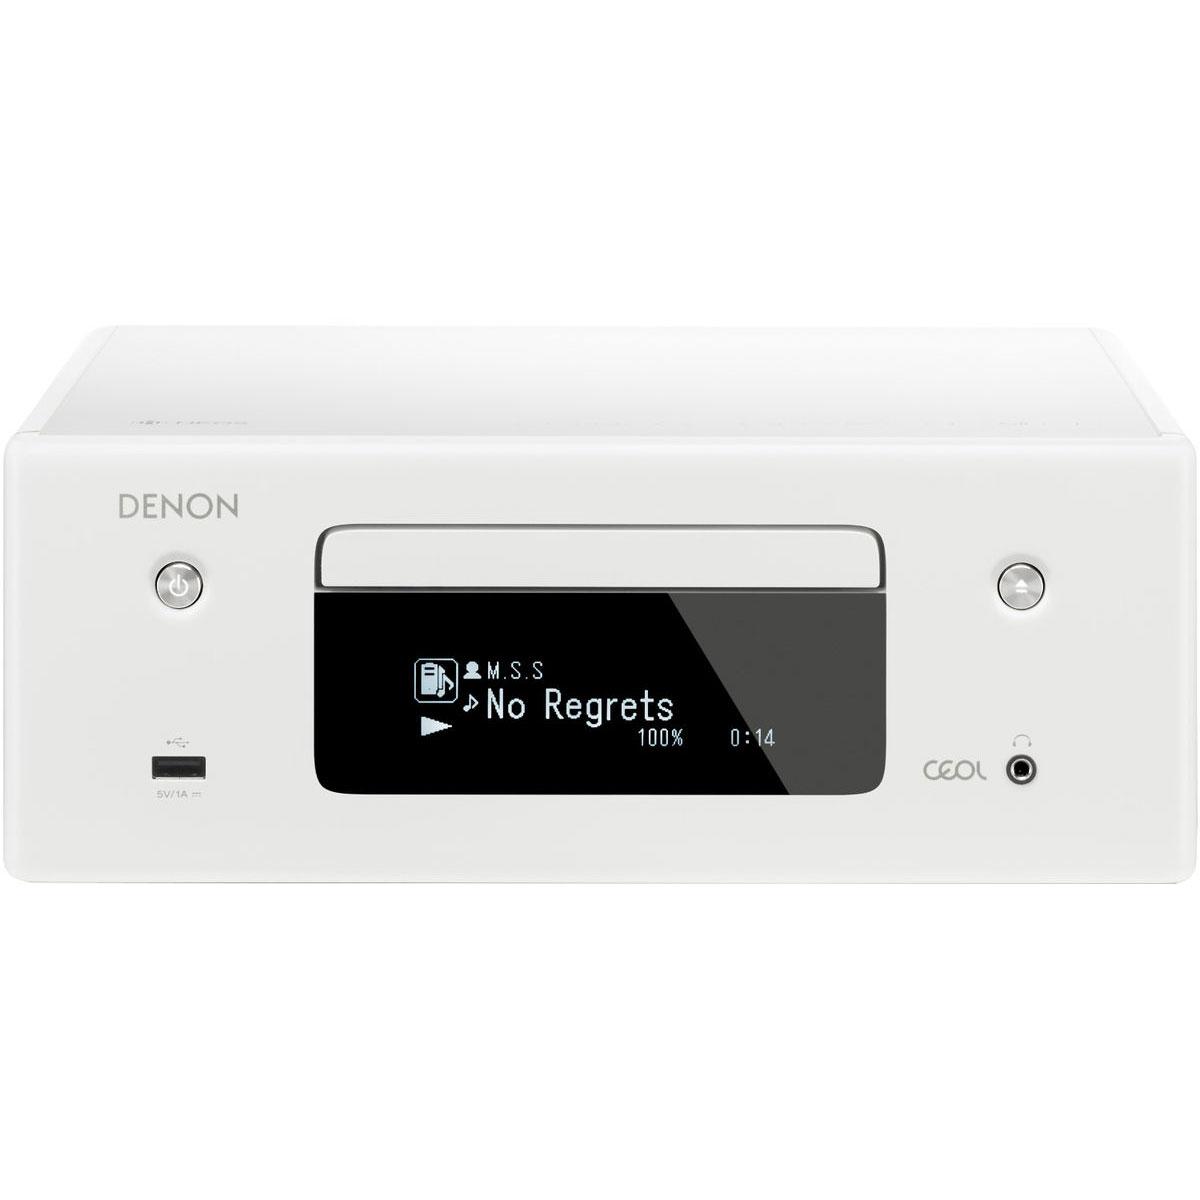 Chaîne Hifi Denon CEOL N10 Blanc - Sans HP Micro-chaîne CD MP3 USB réseau Wi-Fi Bluetooth avec contrôle iOS, Android et Amazon Alexa (sans haut-parleurs)